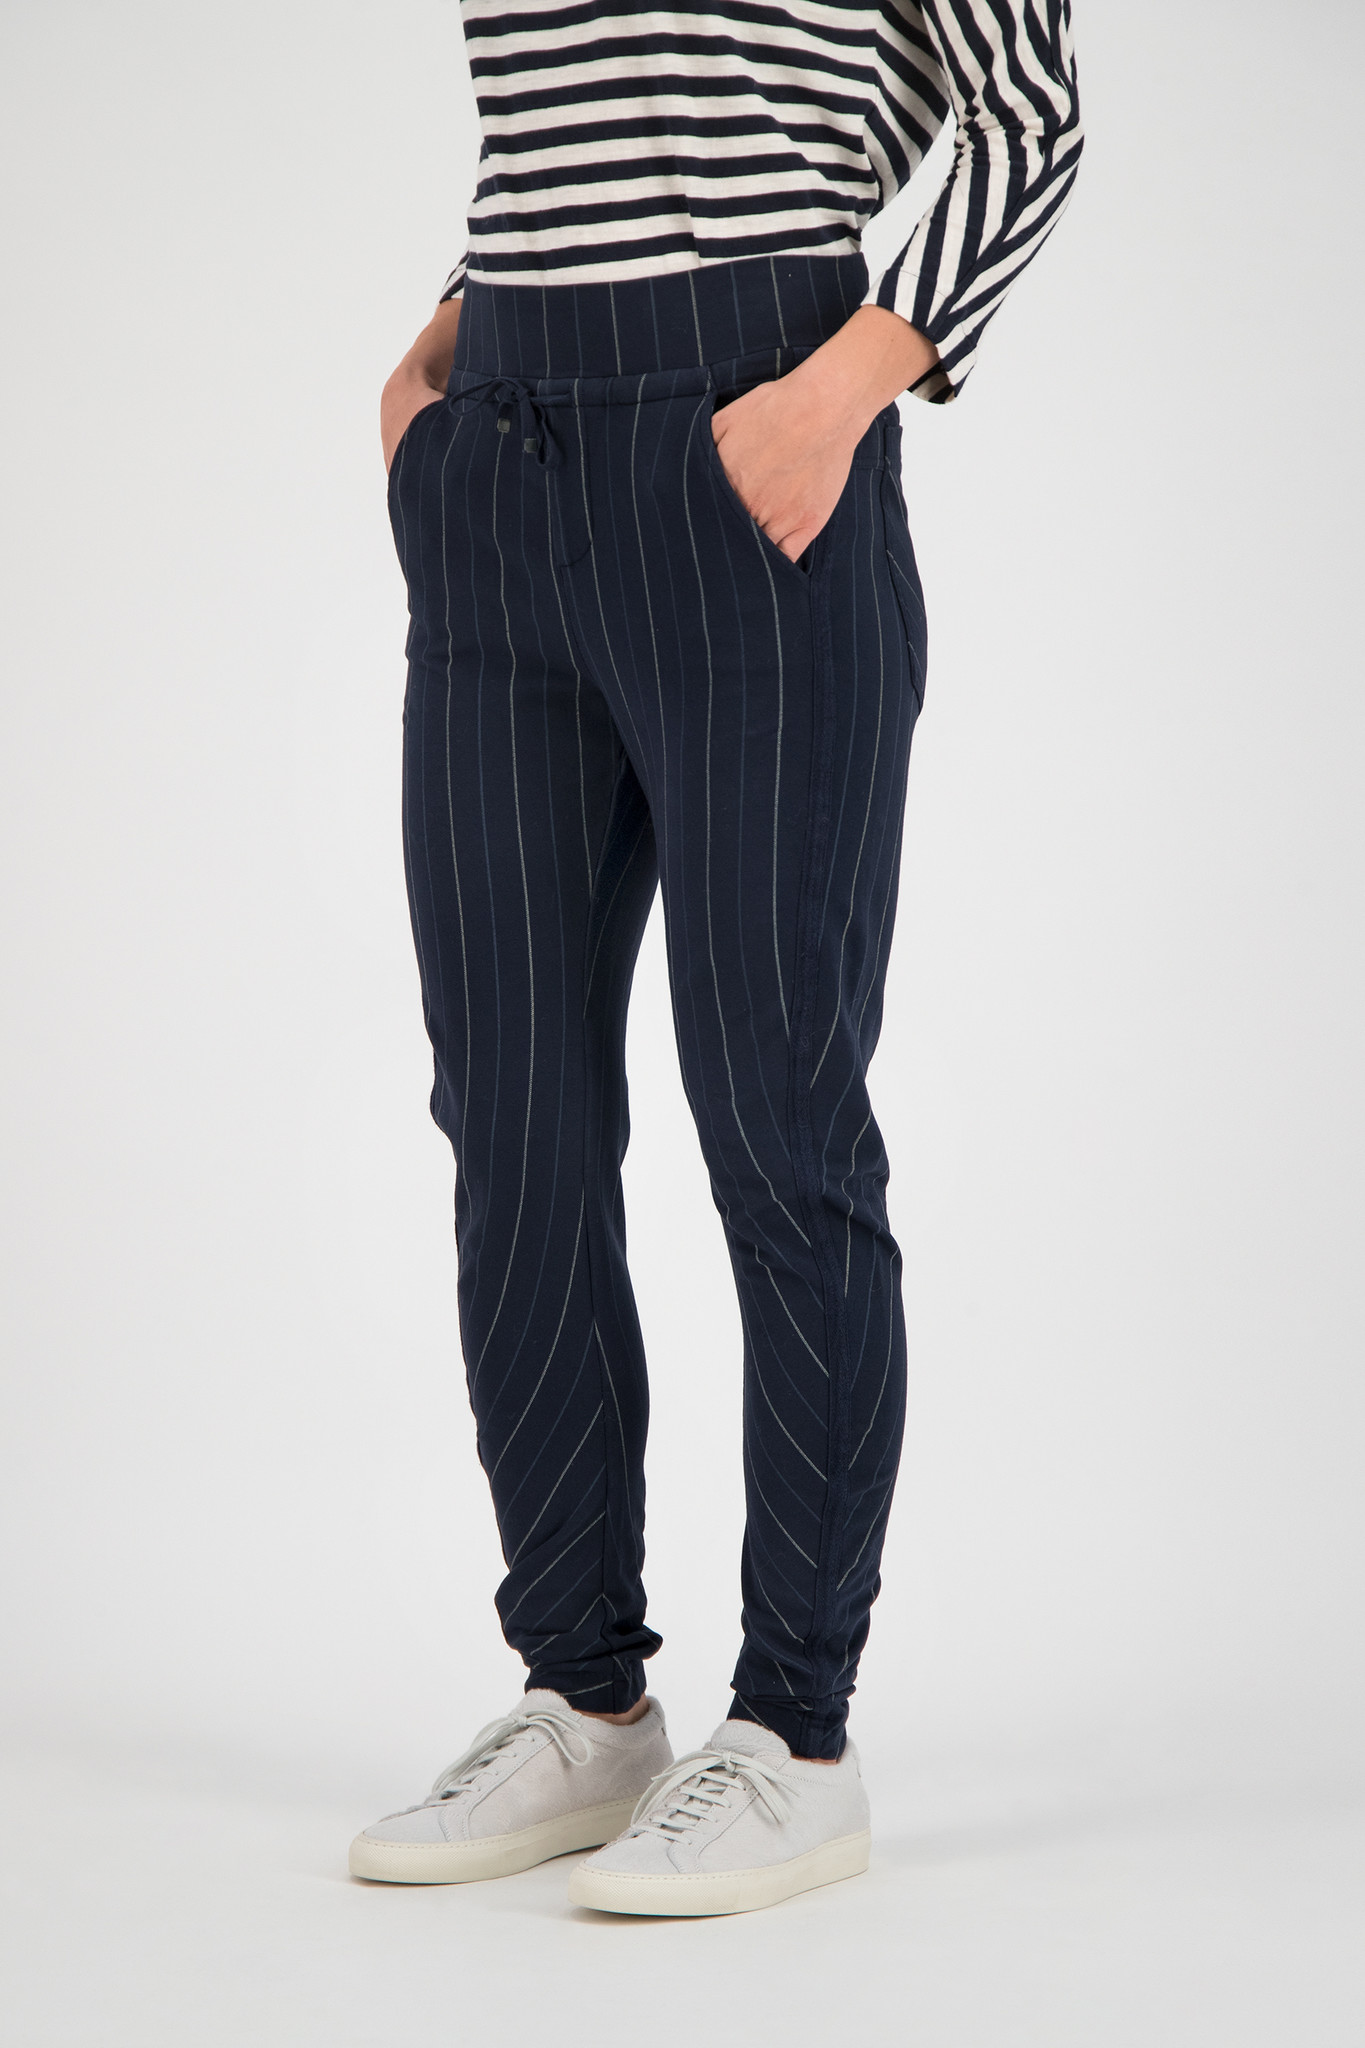 SYLVER Stripe Sweat Trousers - Dark Blue